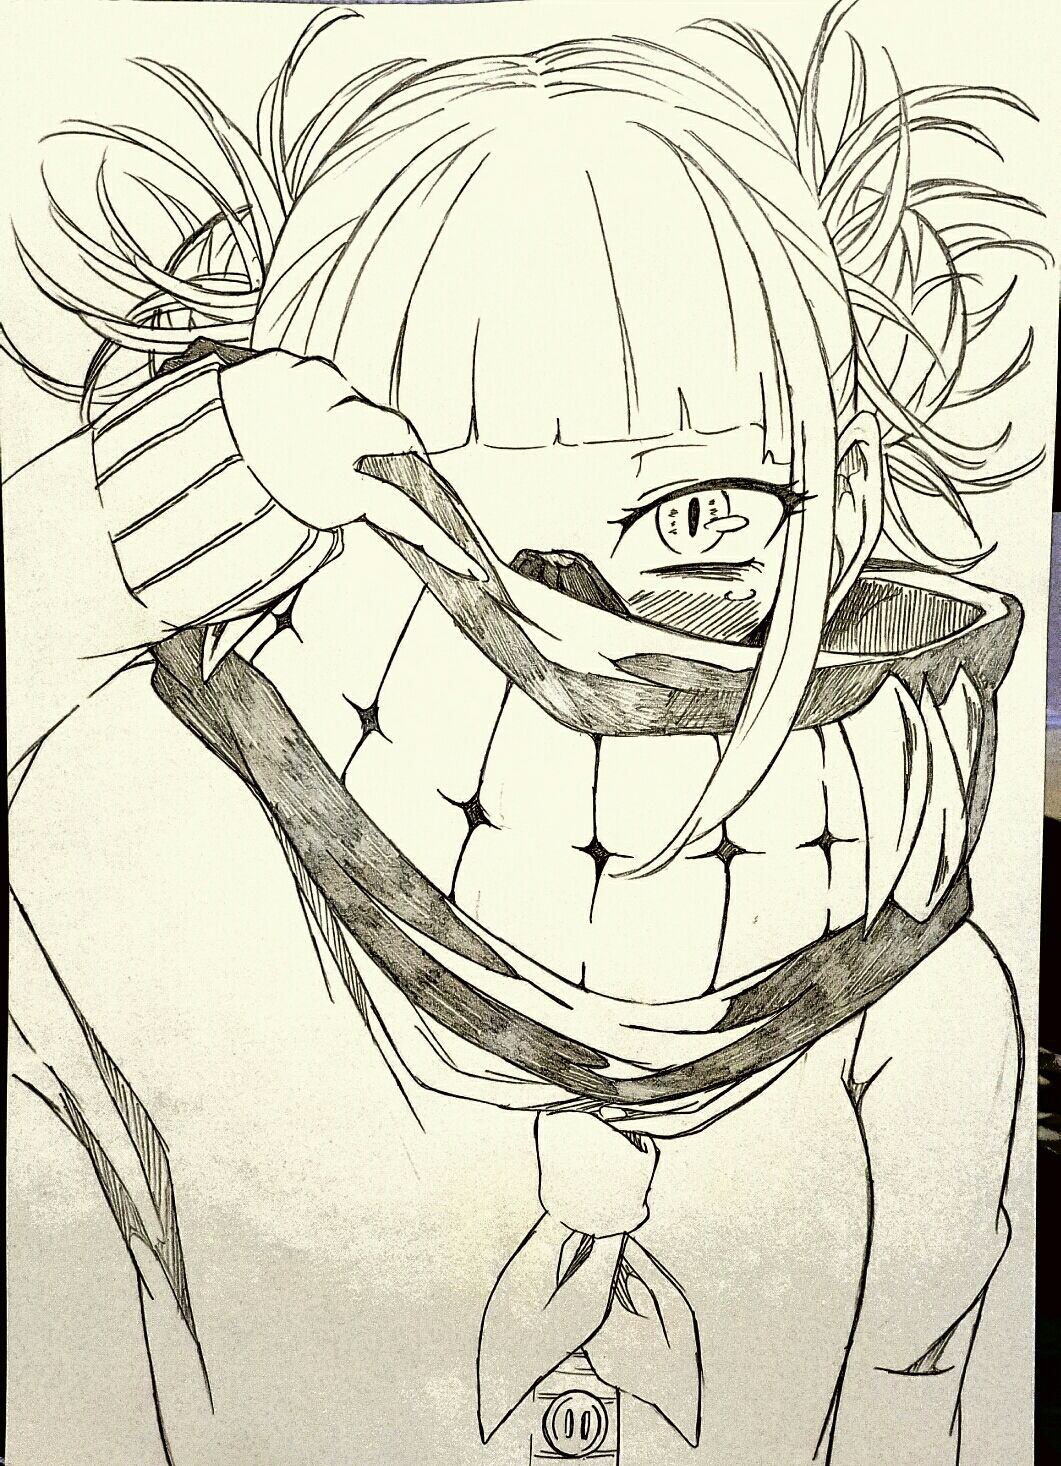 Dibujos Anime: Himiko Toga (Dibujo/Drawing) By 翔